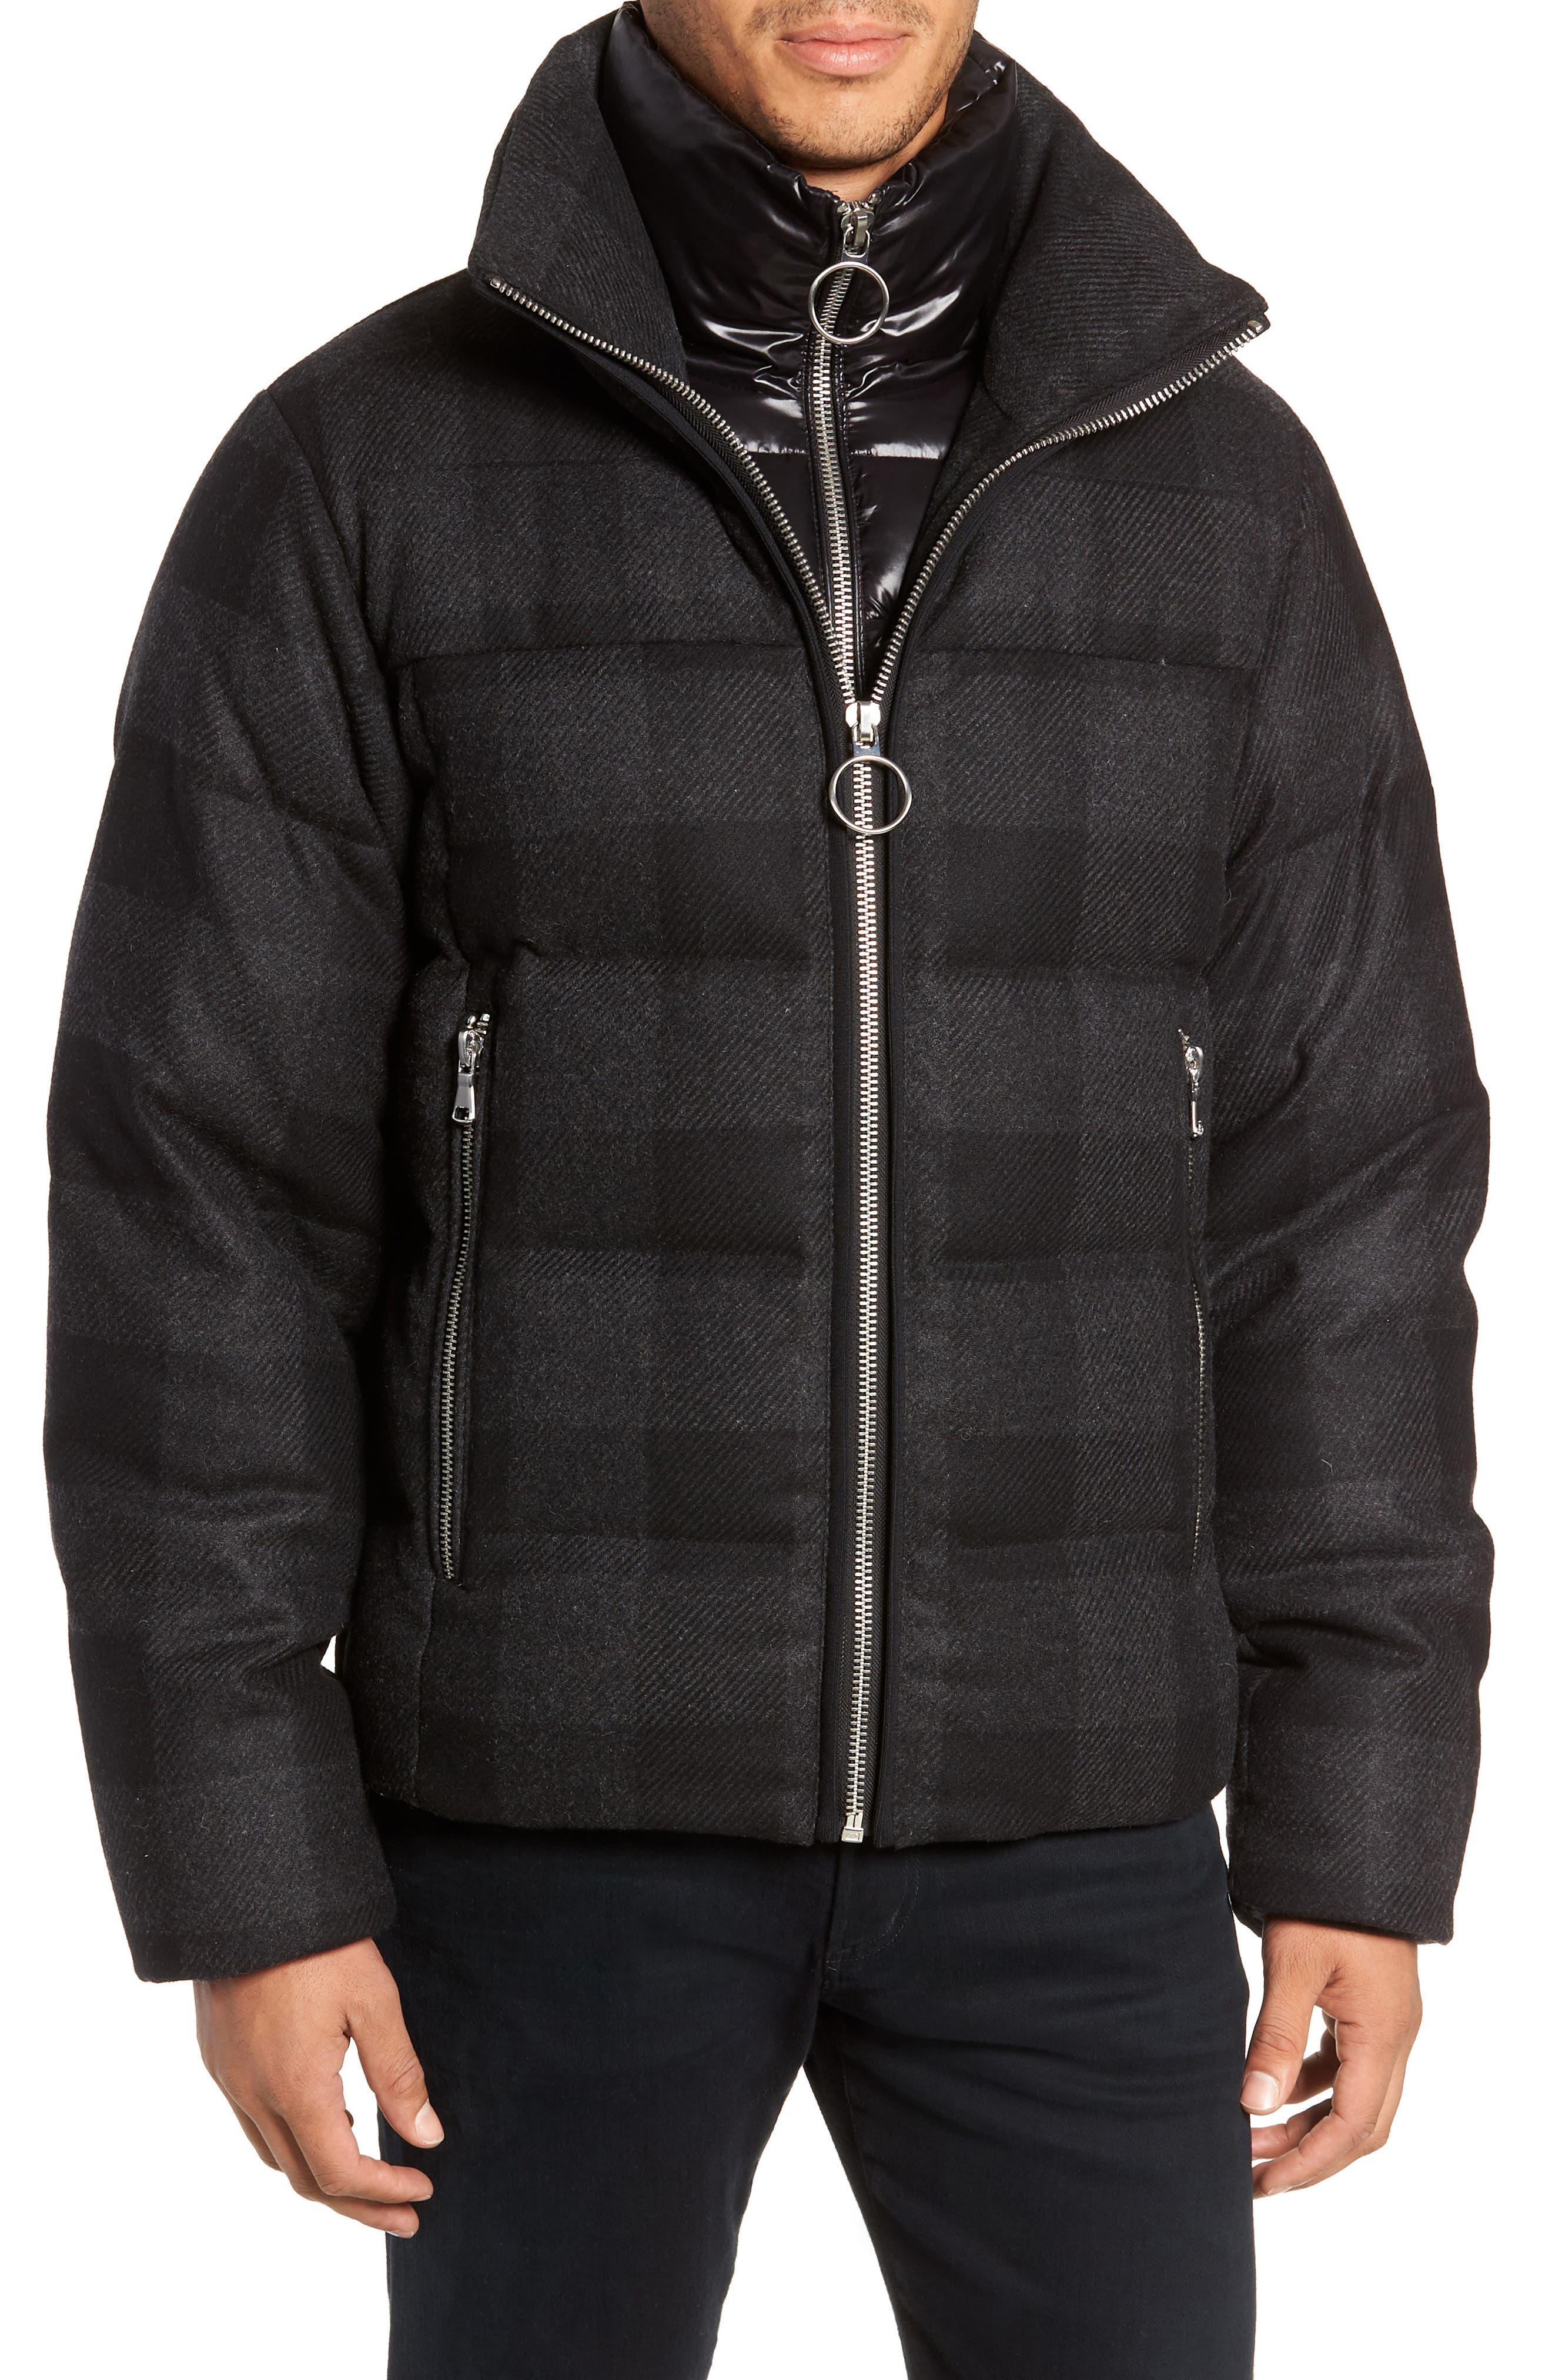 Crosby Plaid Wool Bib Puffer Jacket,                             Alternate thumbnail 4, color,                             CHARCOAL/ BLACK PLAID